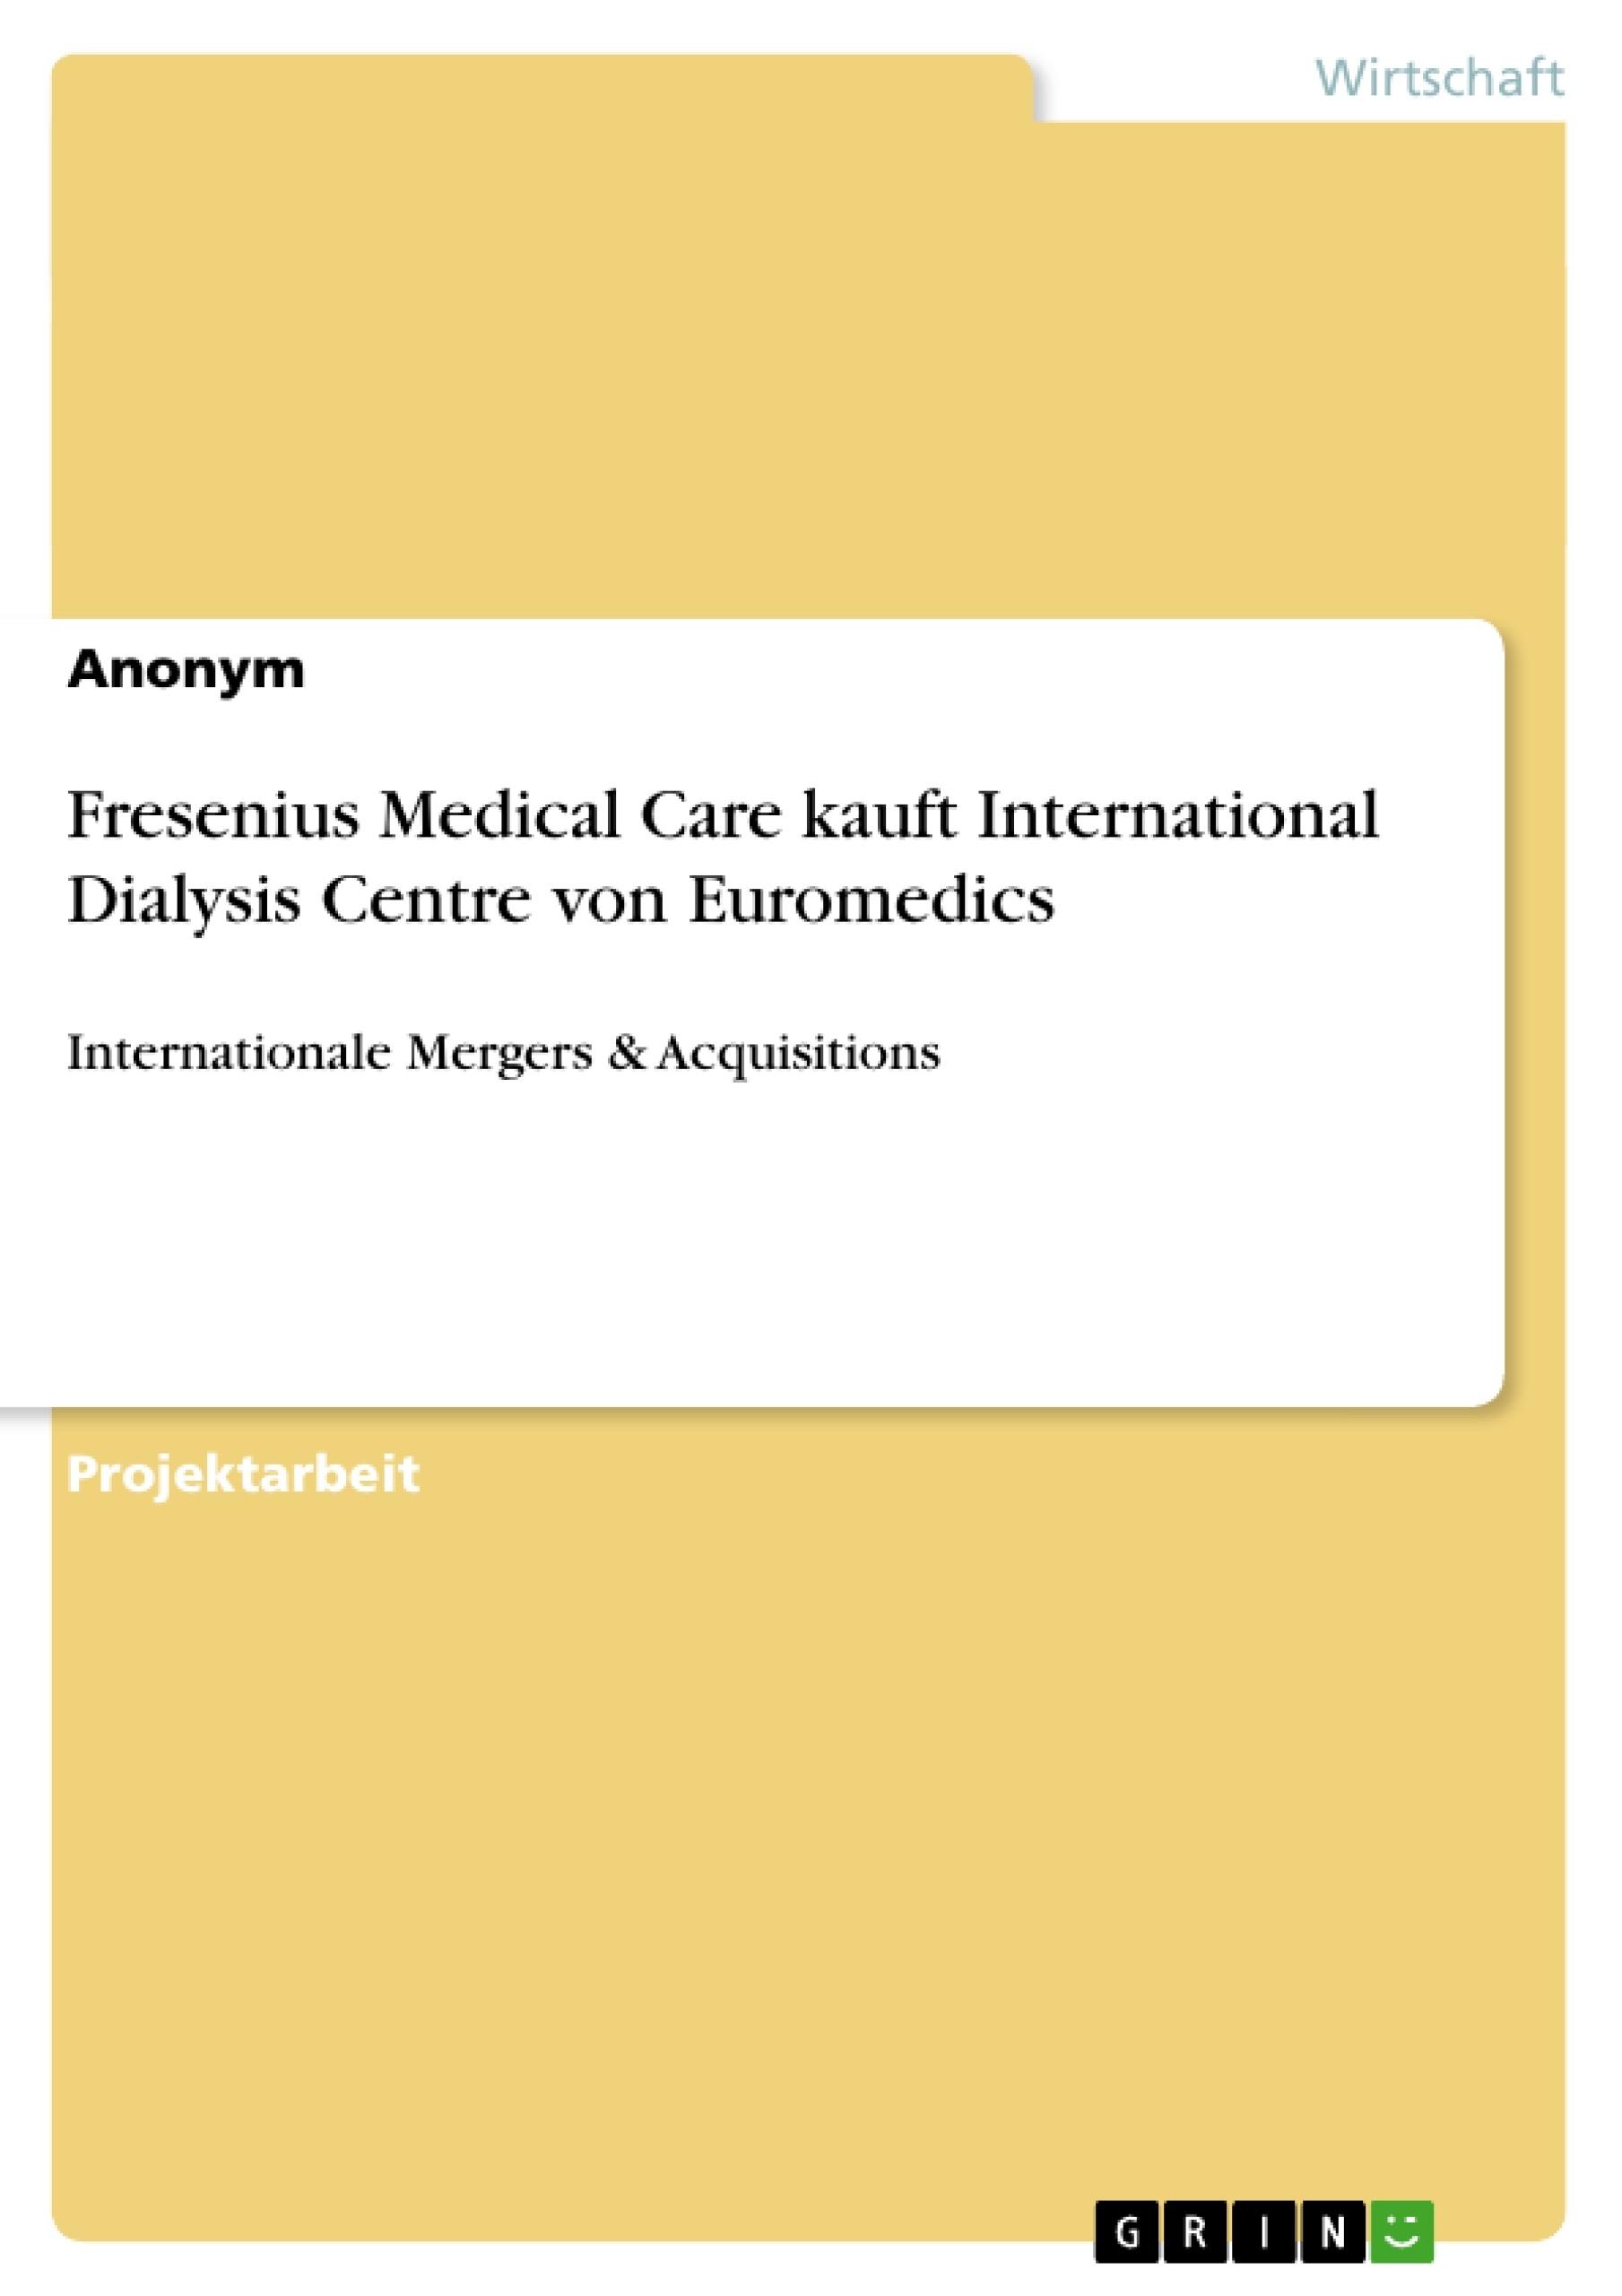 Titel: Fresenius Medical Care kauft International Dialysis Centre von Euromedics